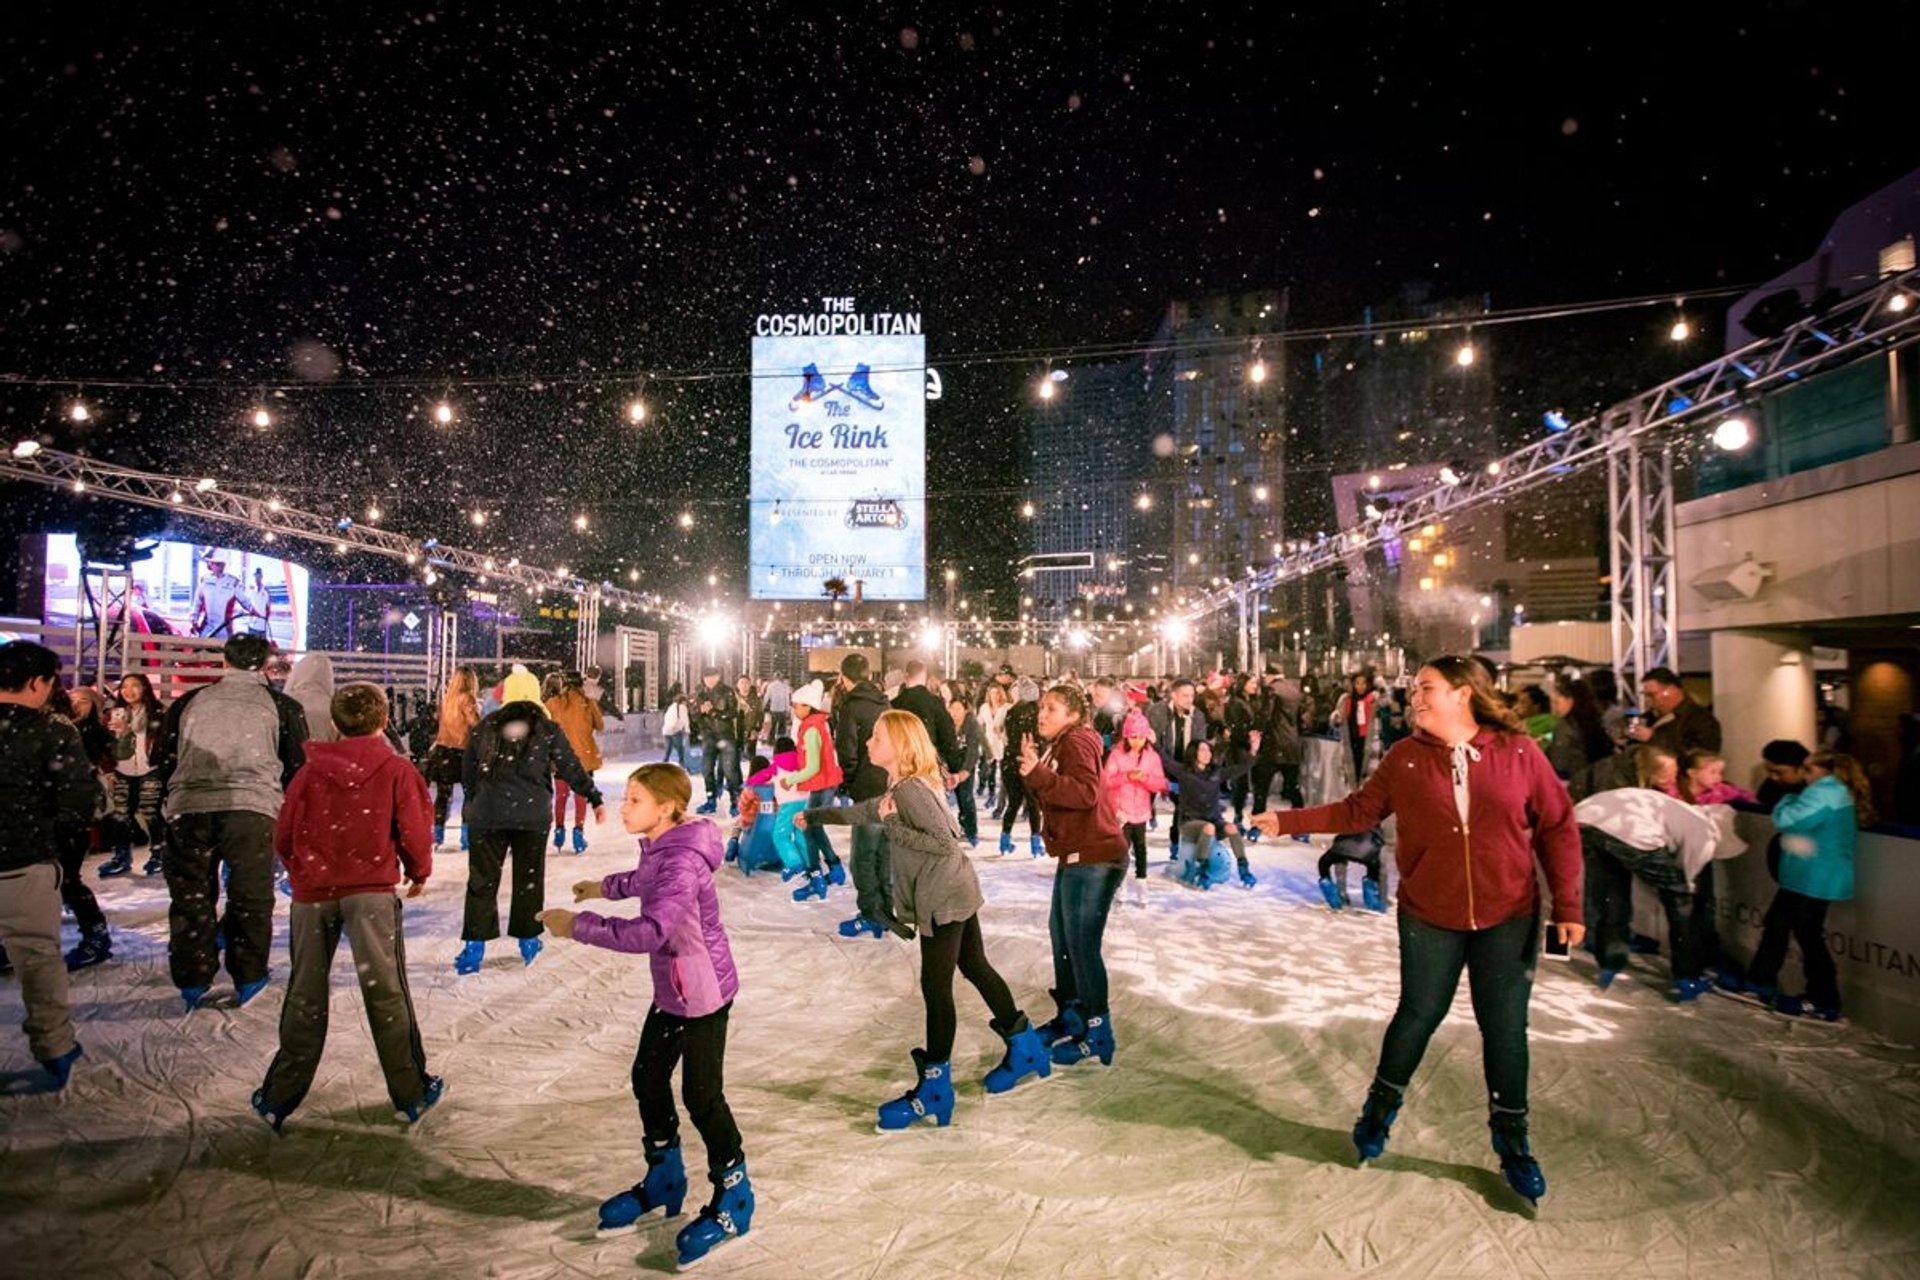 Ice Rink at the Cosmopolitan in Las Vegas 2019 - Best Time